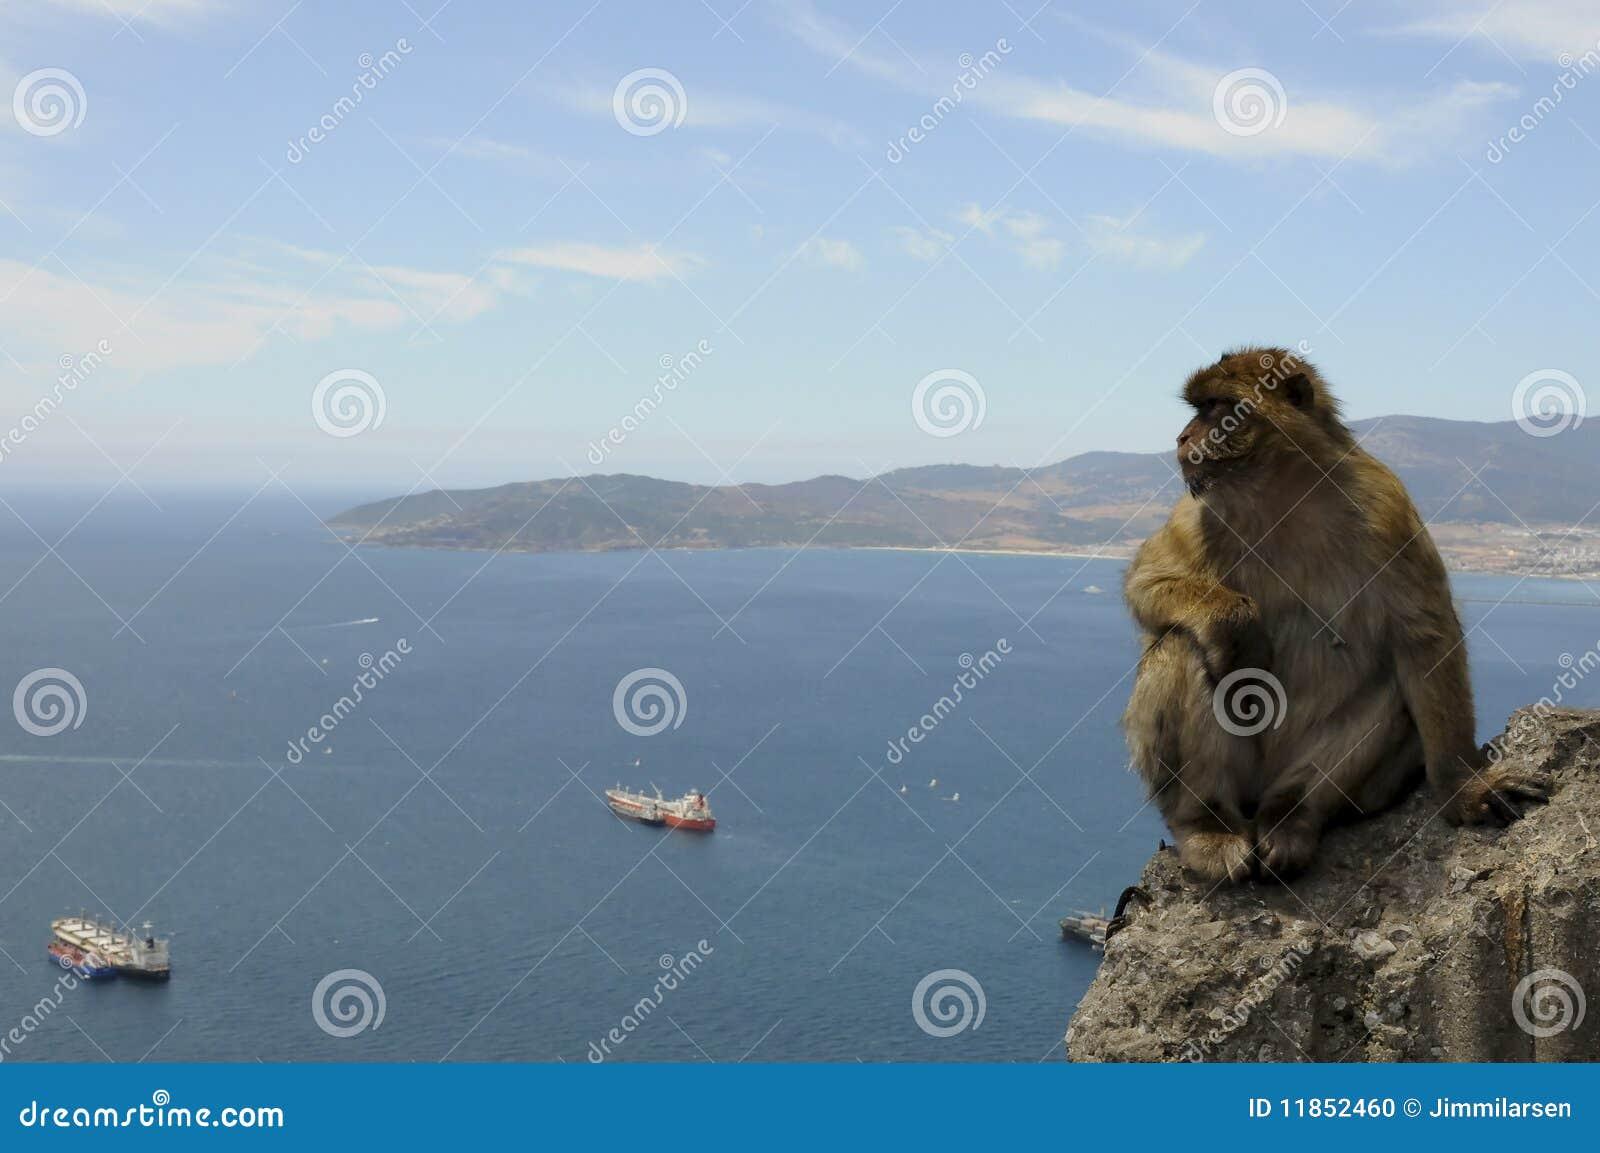 Barbary Macaque thinking